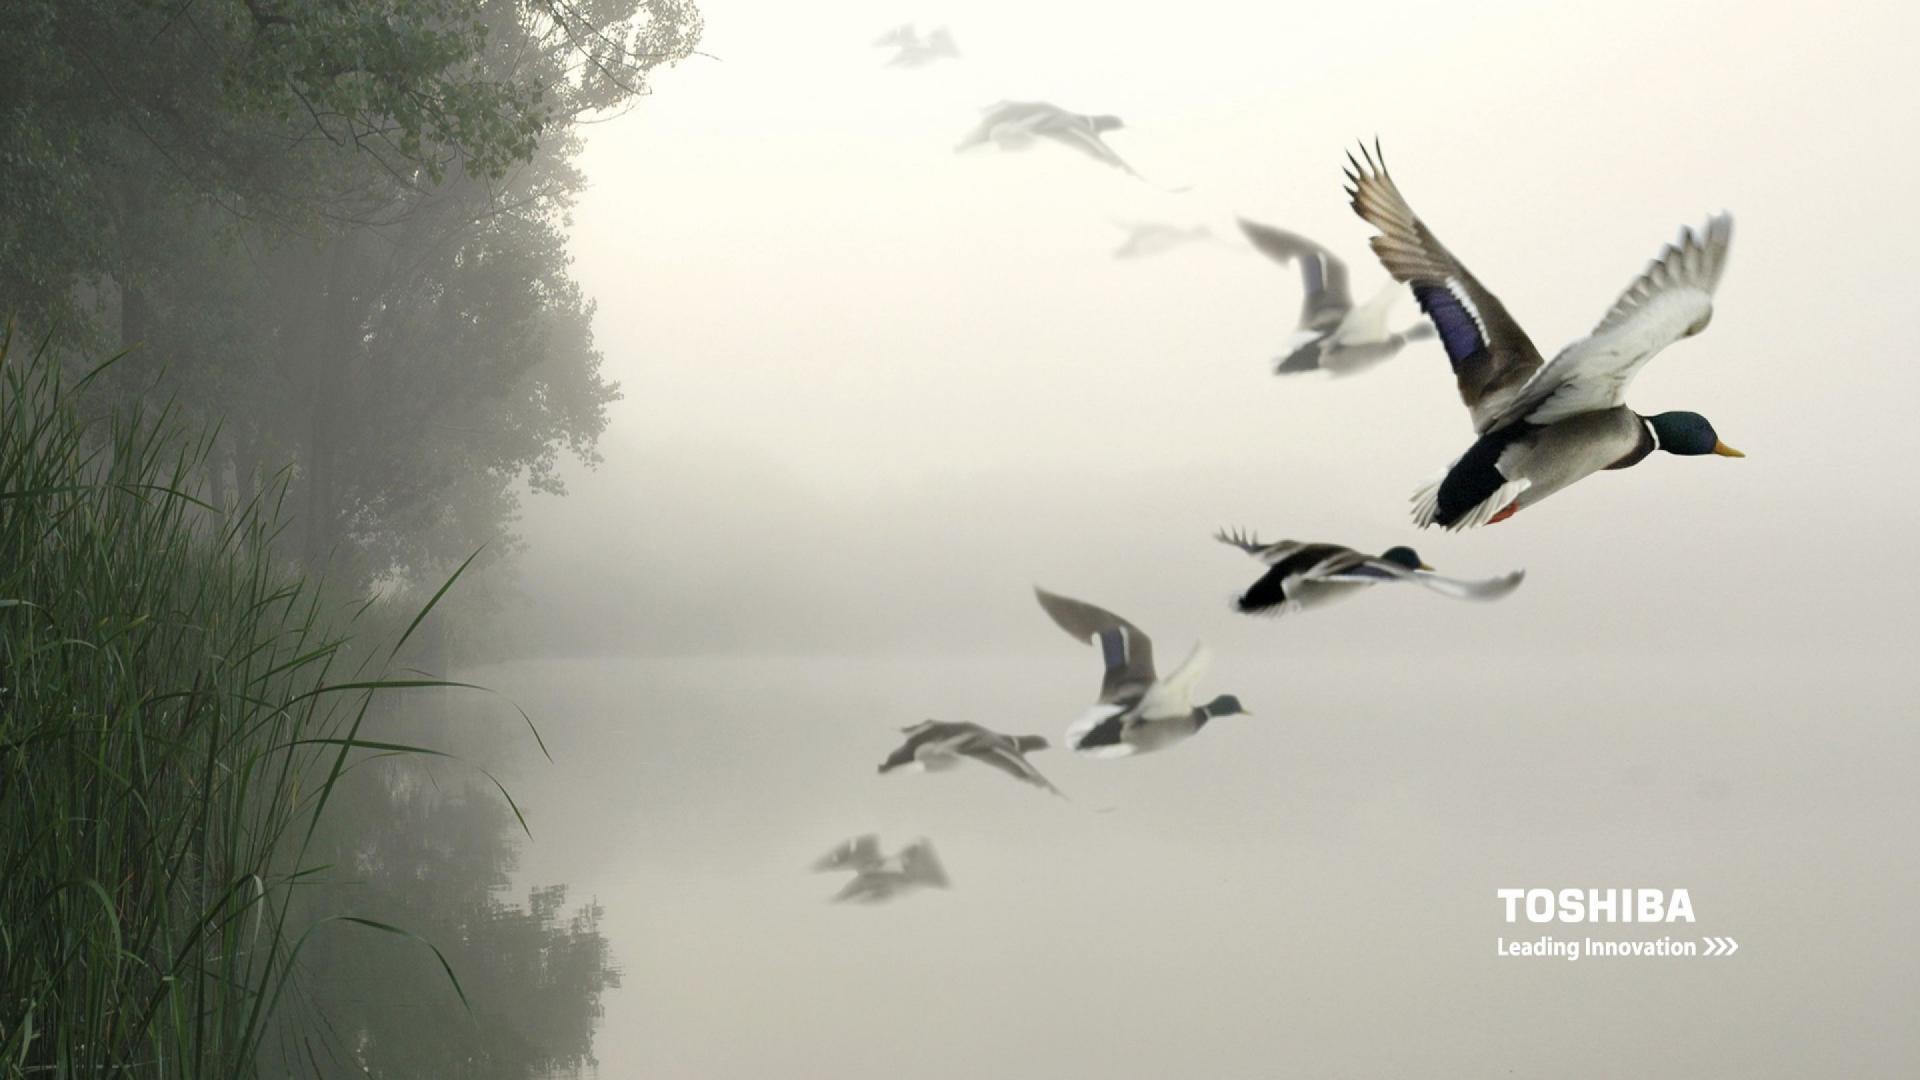 http://3.bp.blogspot.com/-FhFBX7n2SFs/UGra6wOomKI/AAAAAAAALHU/Spgd6DyGVGE/s0/Toshiba-birds-in-the-air-1080x1920.jpg